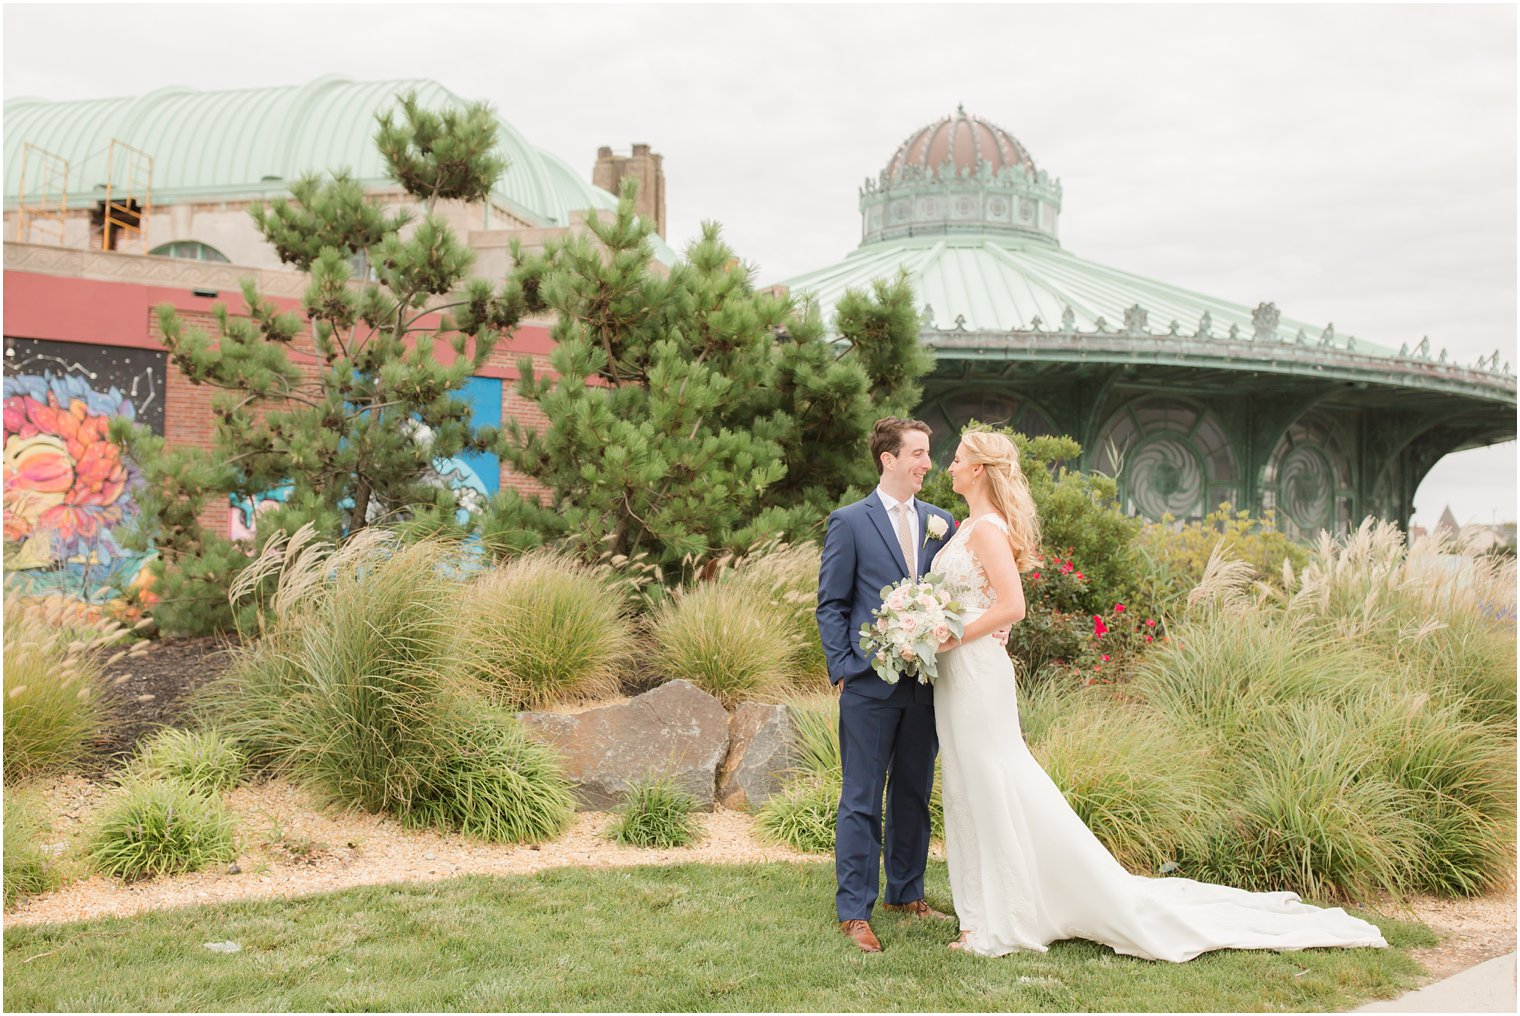 McLoones Pier House Wedding Photos Megan And Tyler